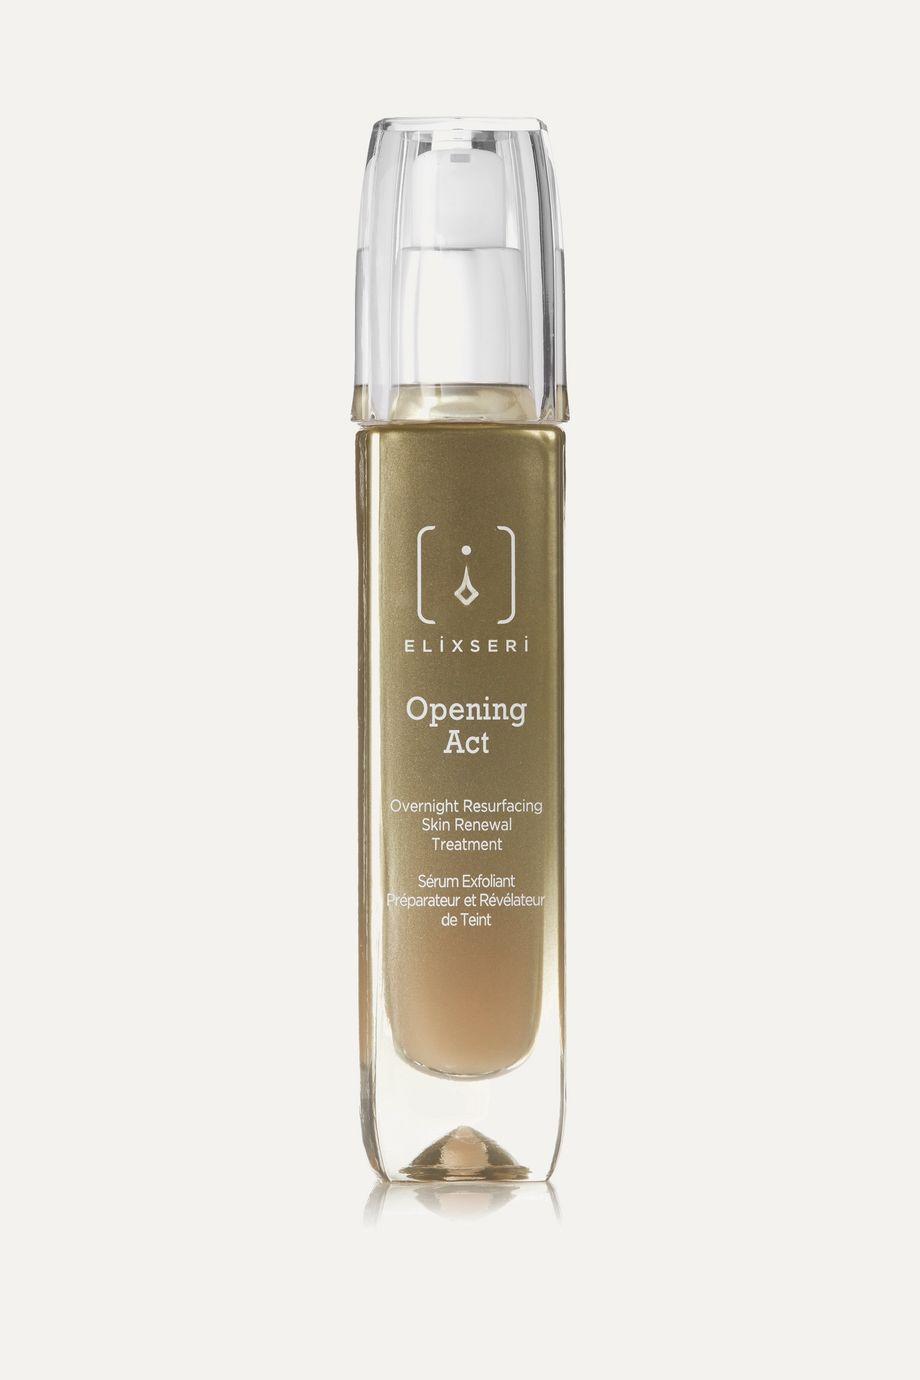 ELIXSERI Opening Act - Overnight Resurfacing Skin Renewal Treatment, 30ml